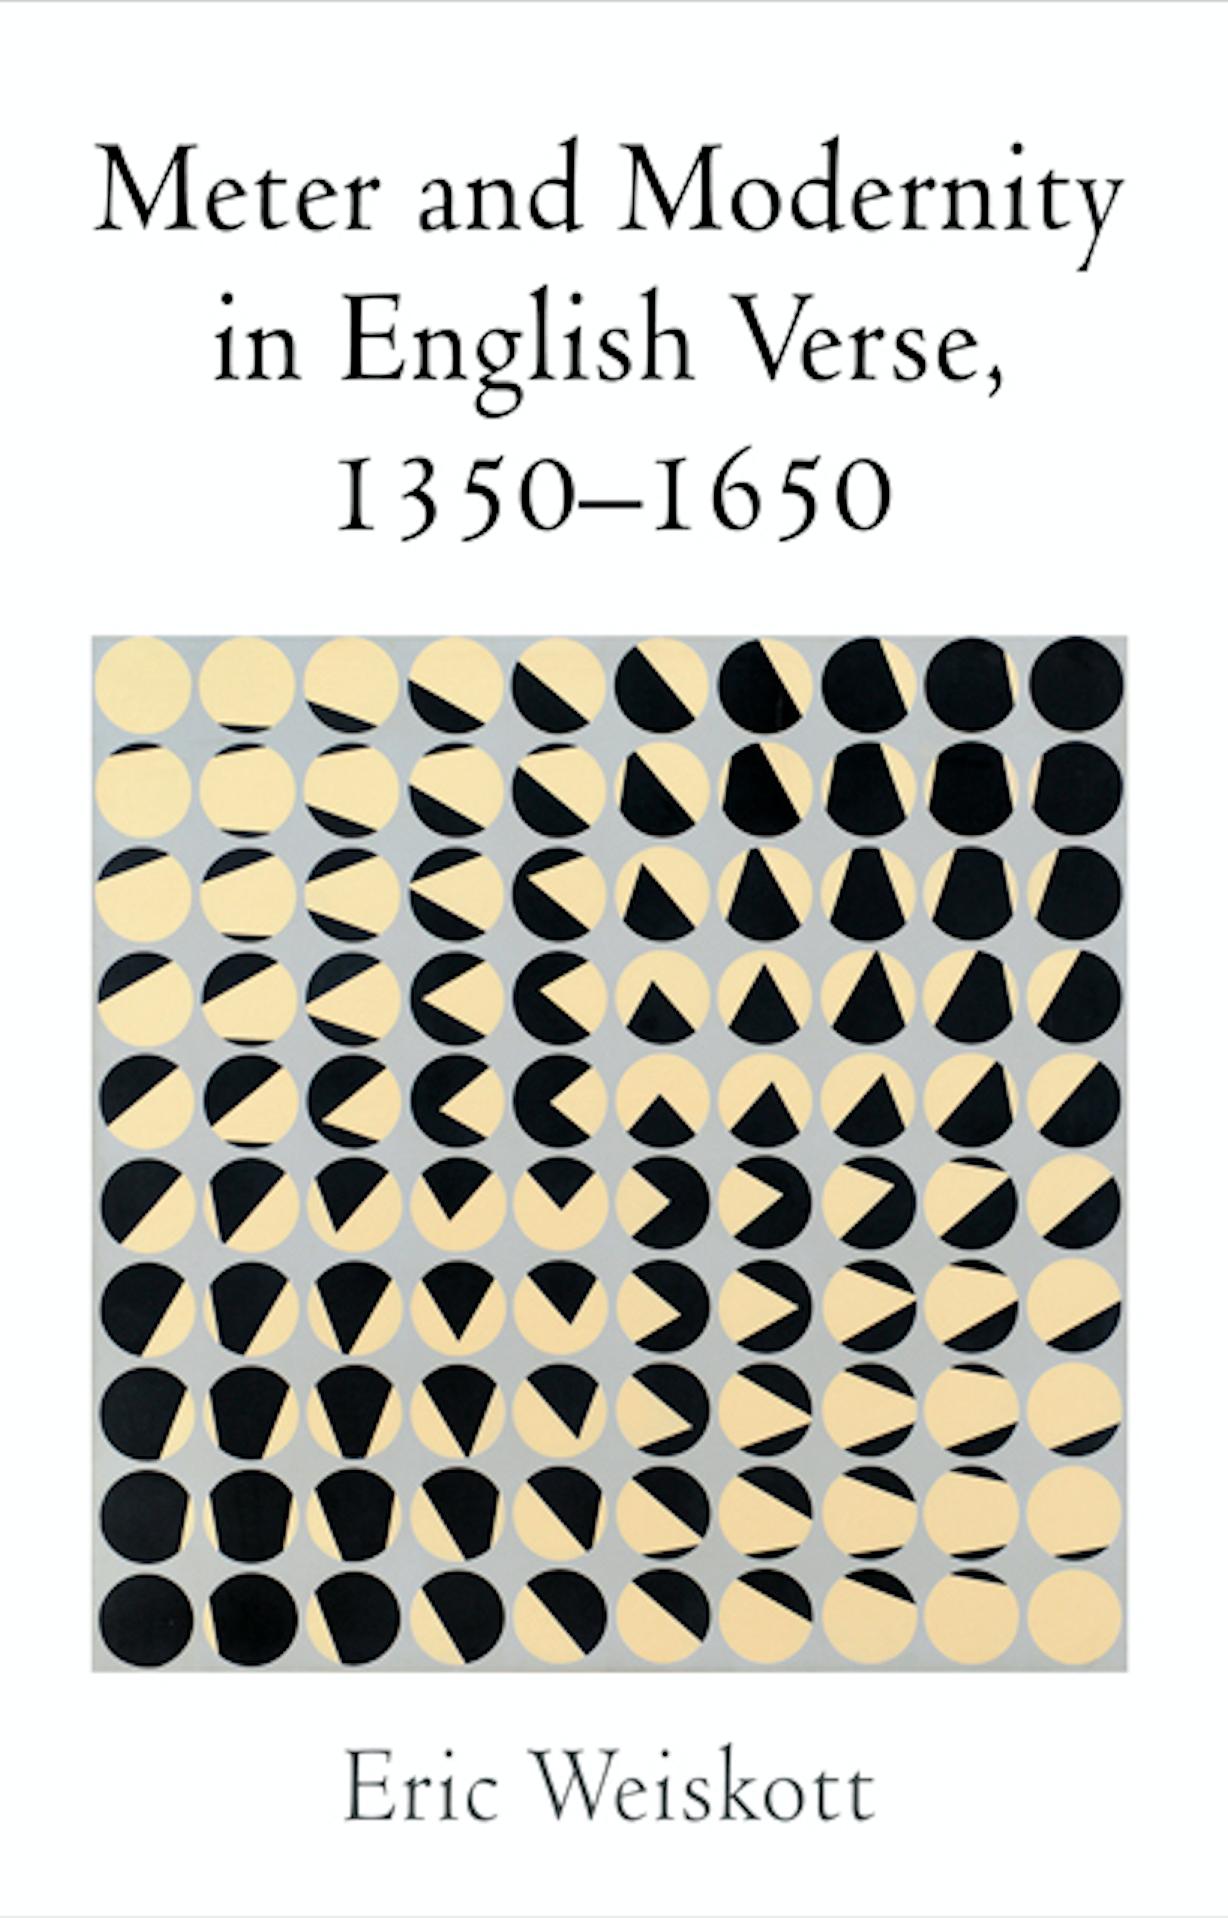 Eric Weiskott, Meter and Modernity in English Verse, 1350-1650